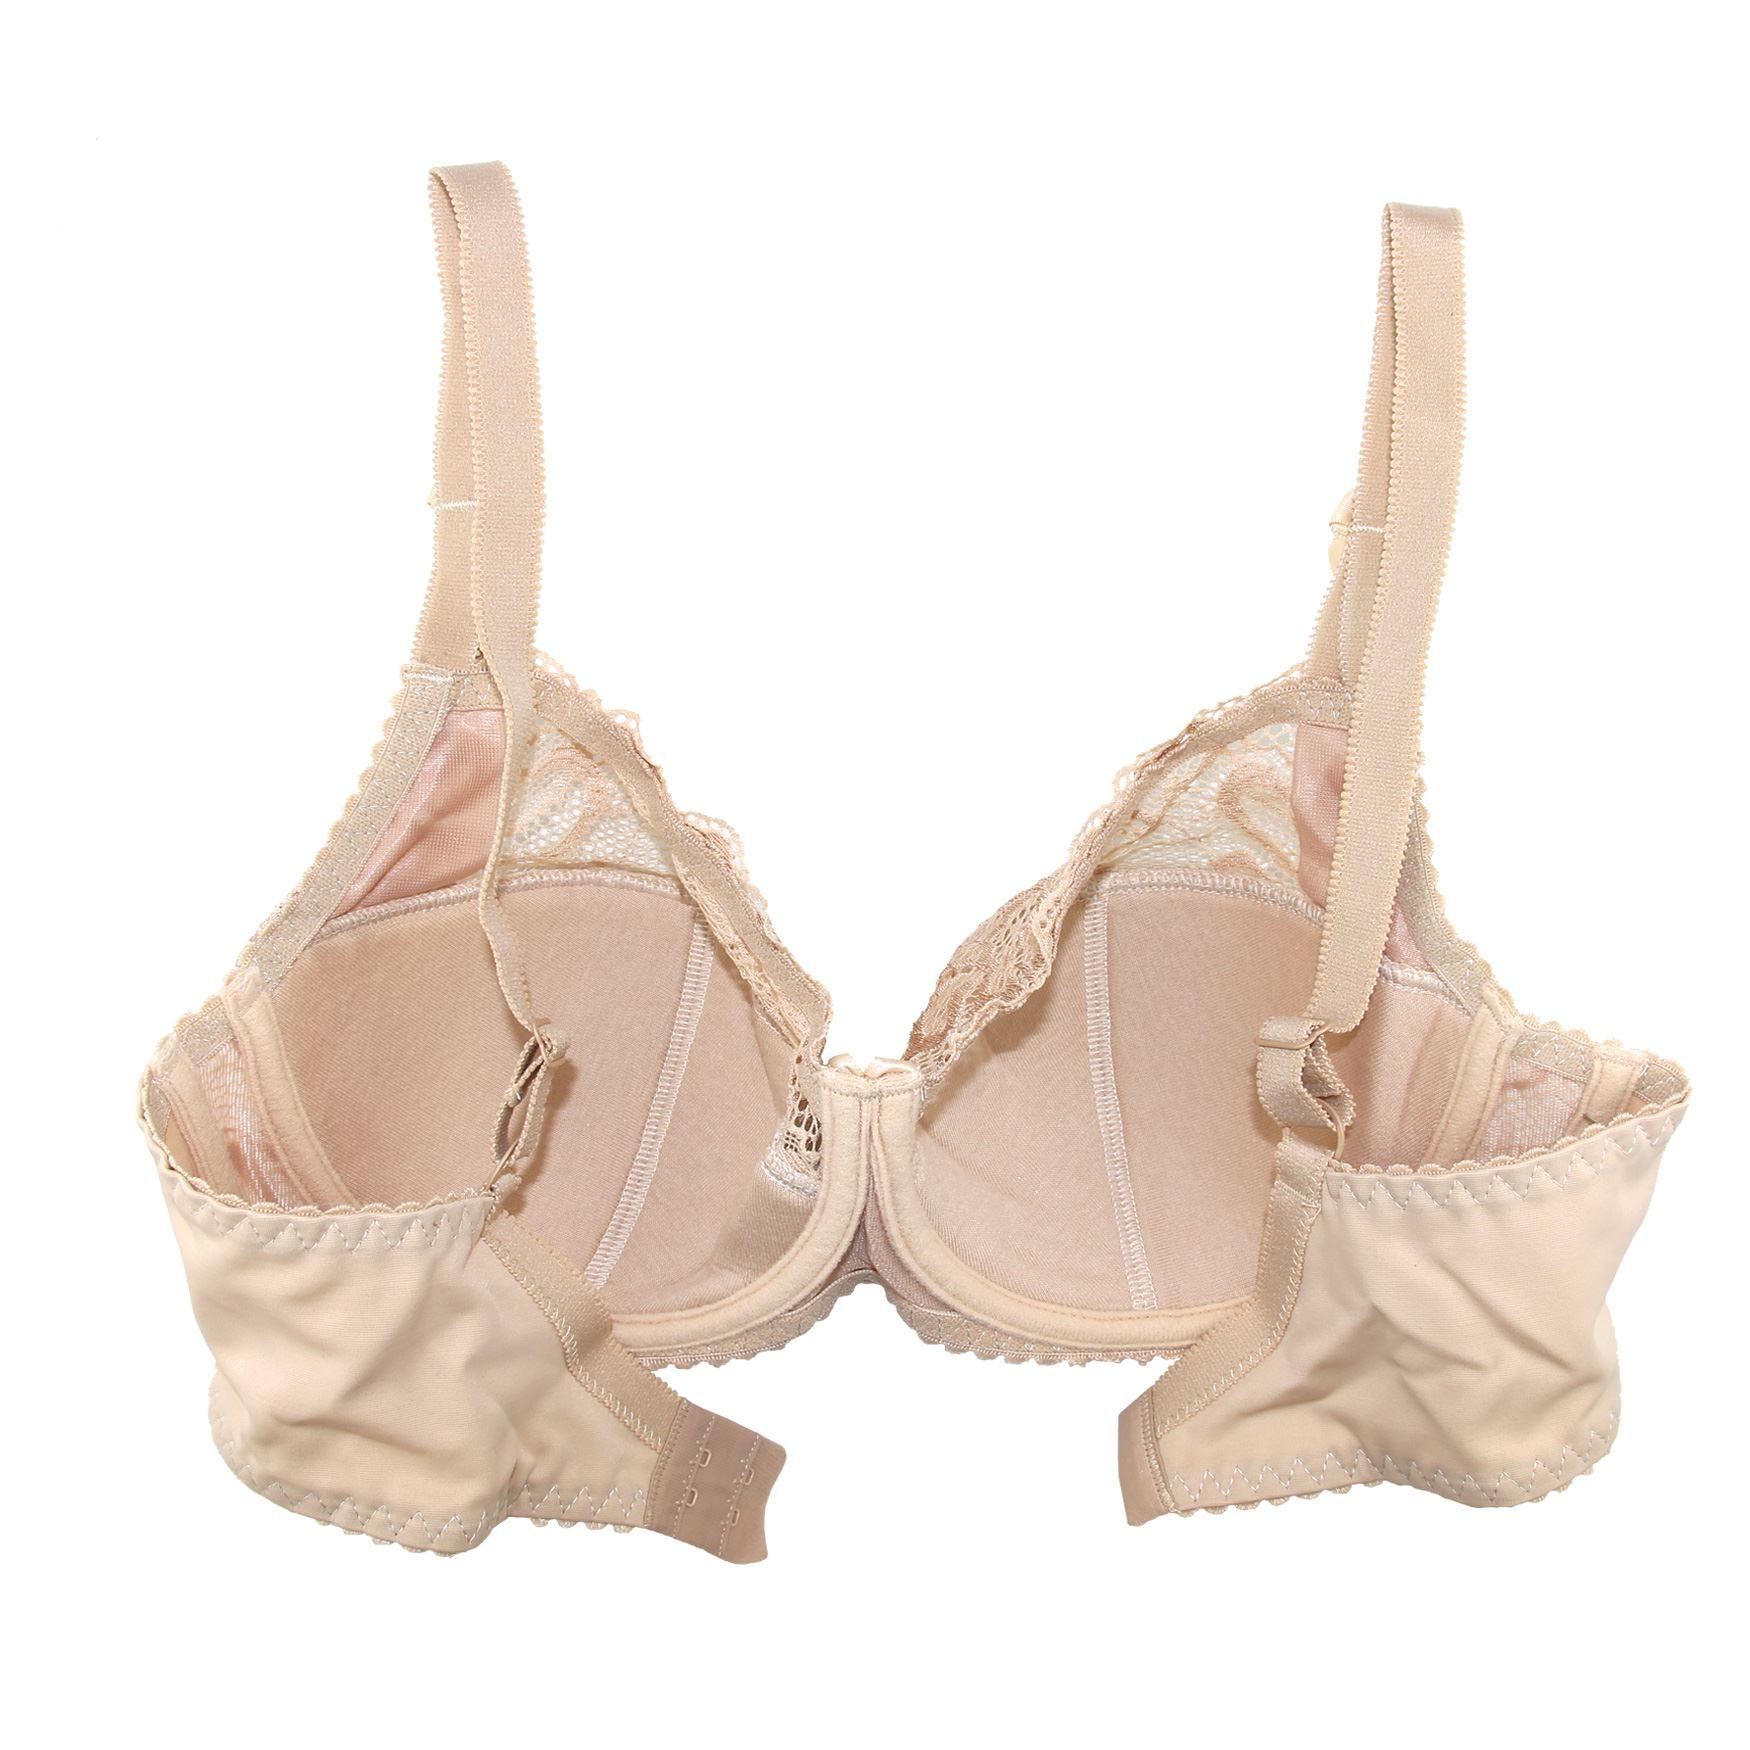 Plus-Size-Bra-Full-Coverage-Underwire-Minimizer-Padded-Comfortable-Lace-Figure thumbnail 5